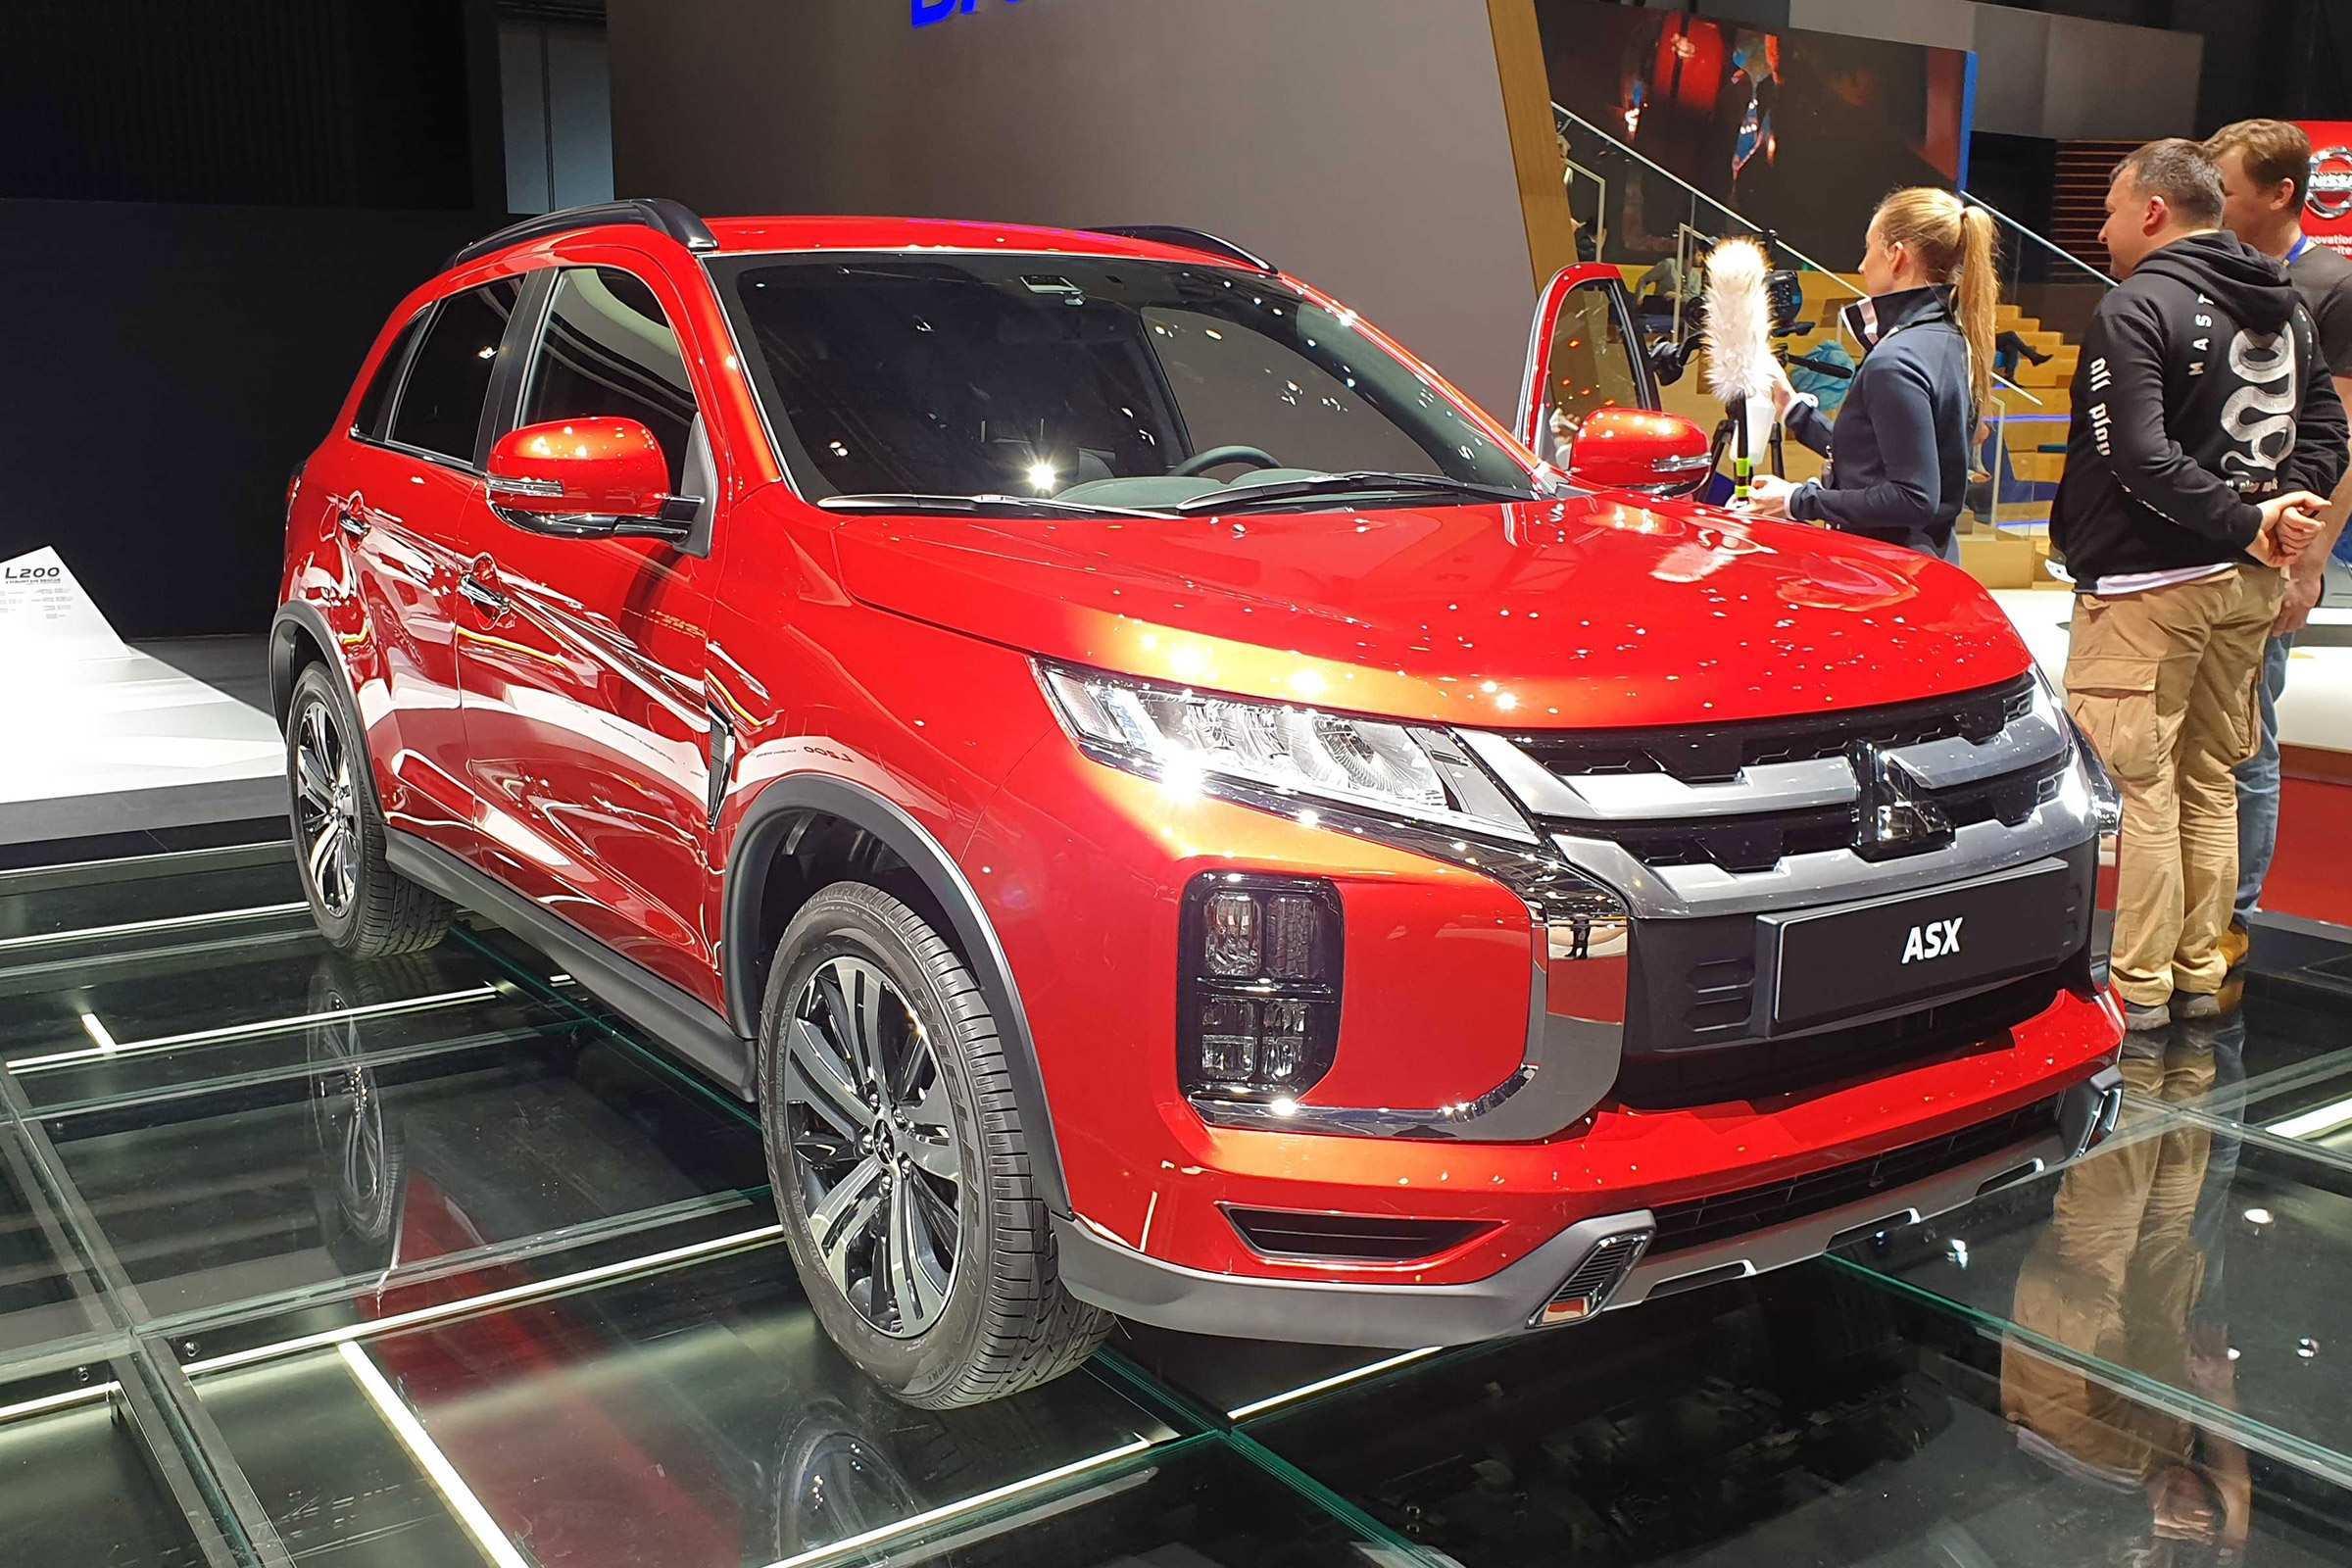 95 Gallery of Mitsubishi Asx 2020 Uk Research New for Mitsubishi Asx 2020 Uk